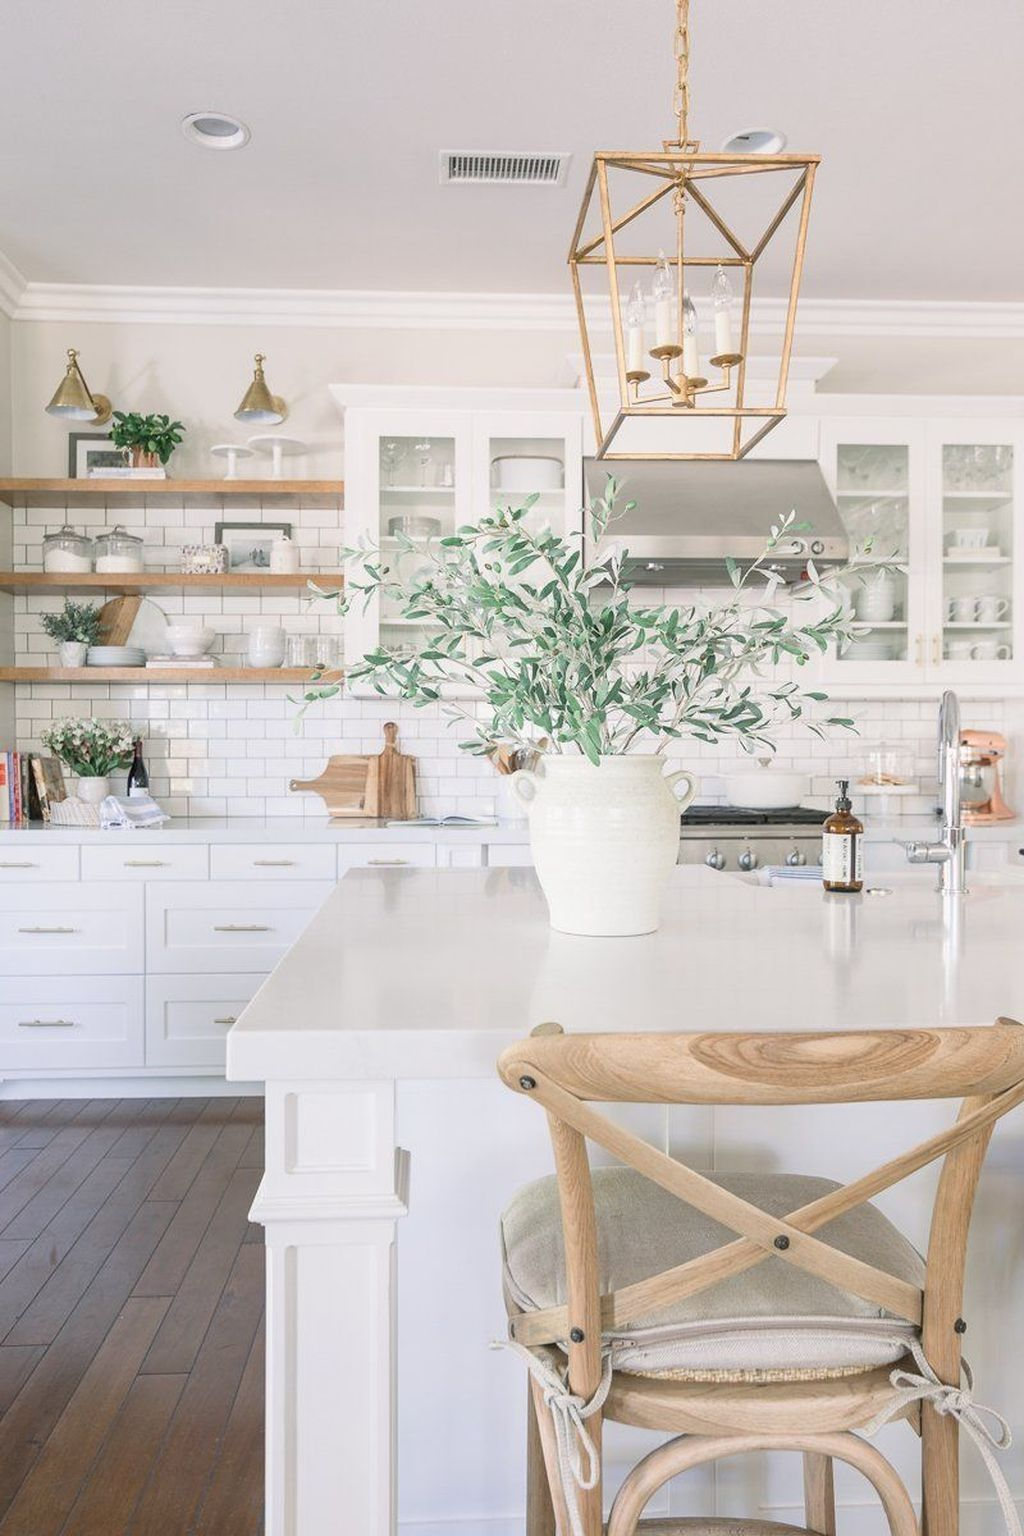 47 Pretty White Kitchen Design Ideas In 2020 With Images White